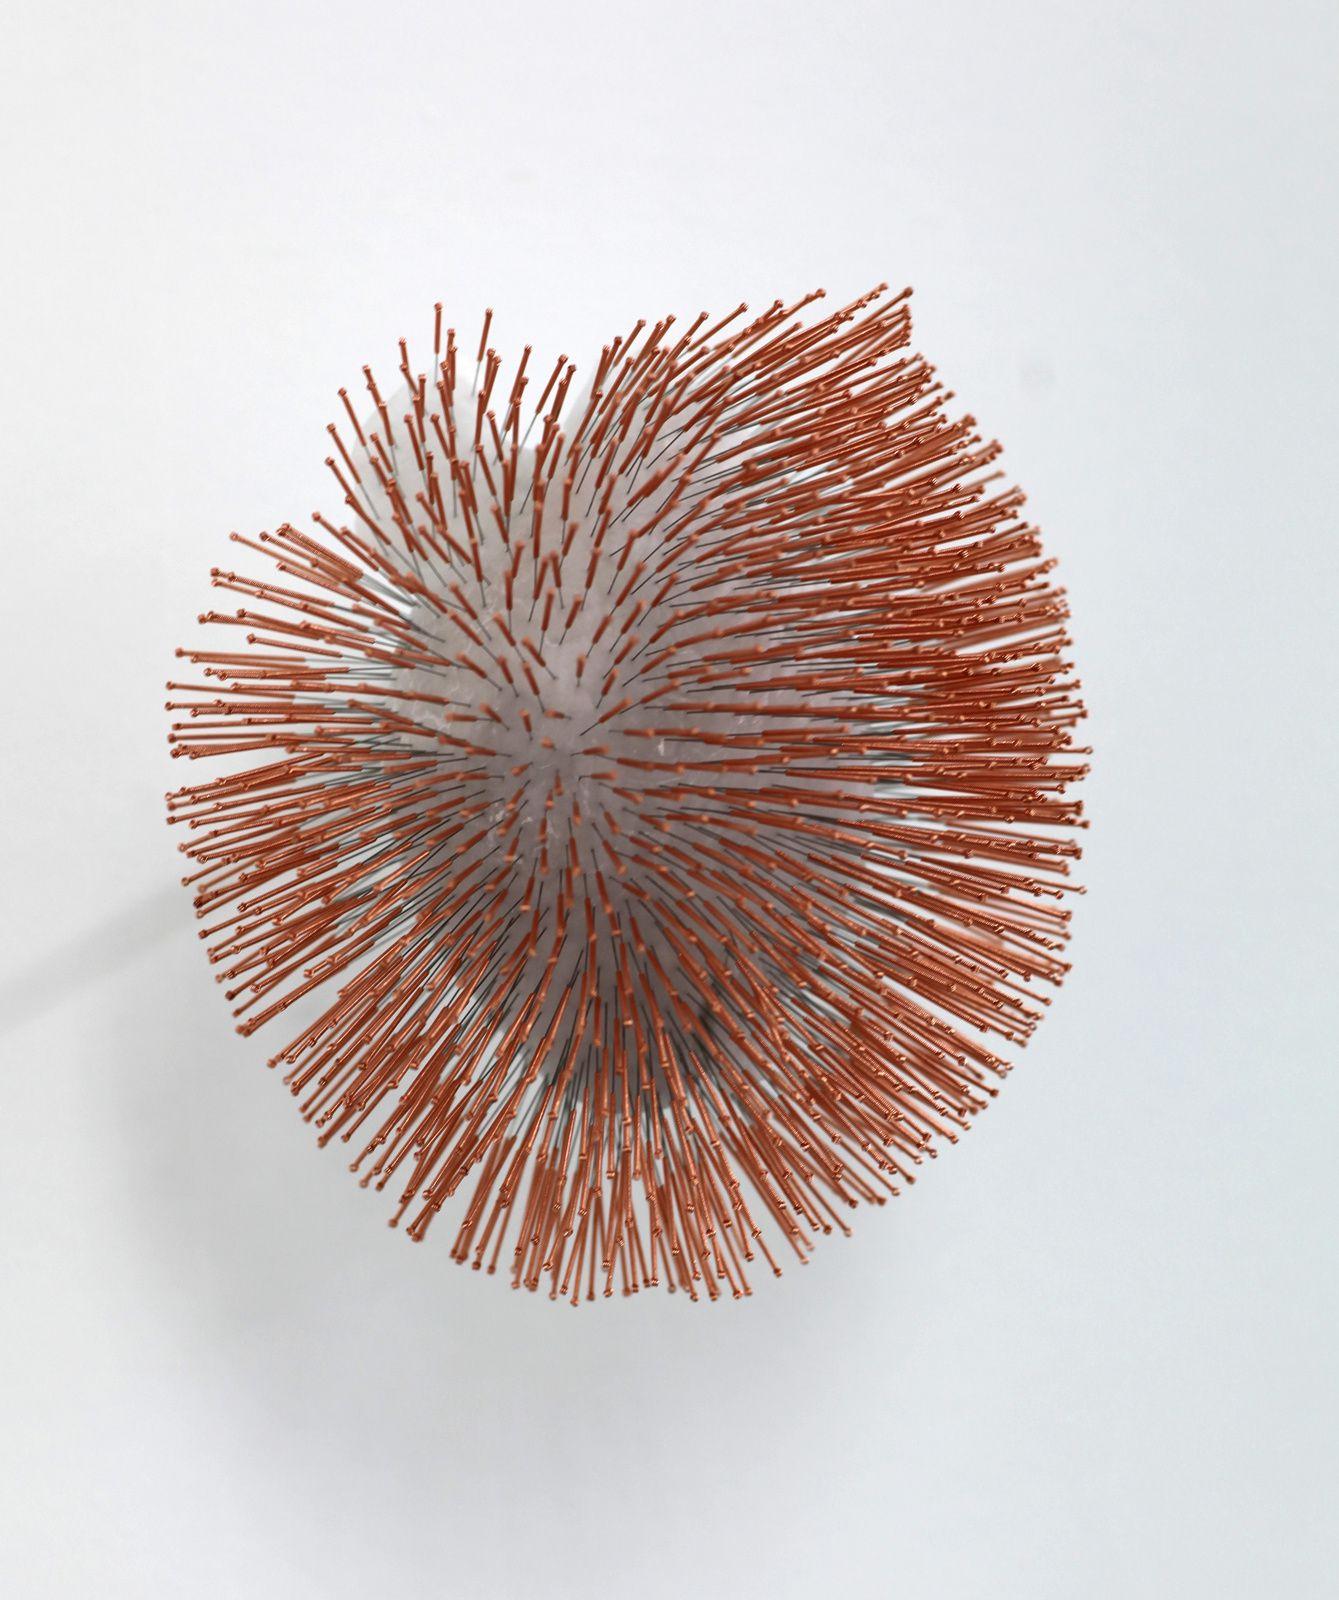 """Heart (needles)"", 2015-2016 de Prune NOURRY - Courtesy Galerie Magda Danysz © Photo Éric Simon"